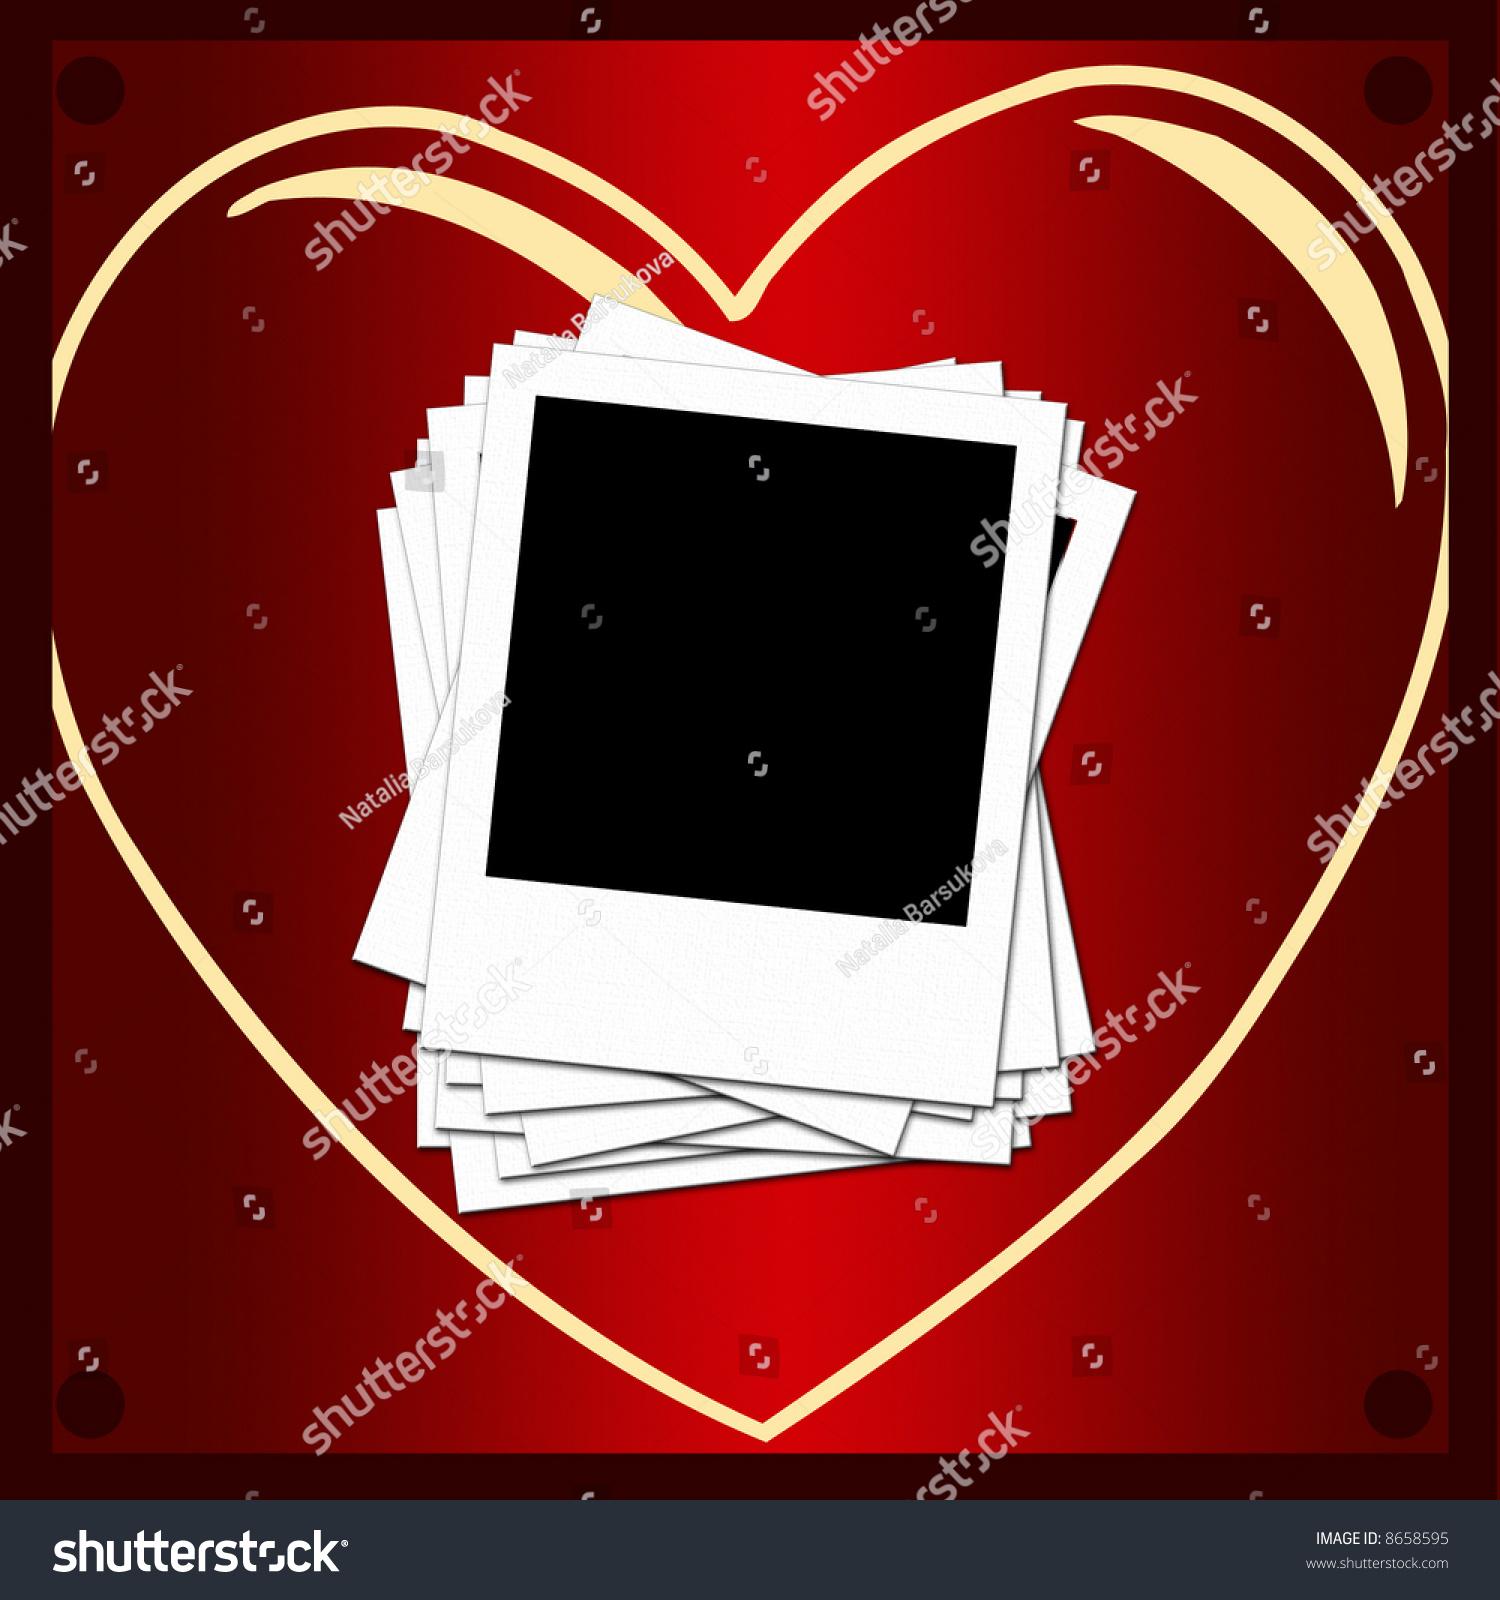 Blank Photo Frames Romantic Background Stock Illustration 8658595 ...